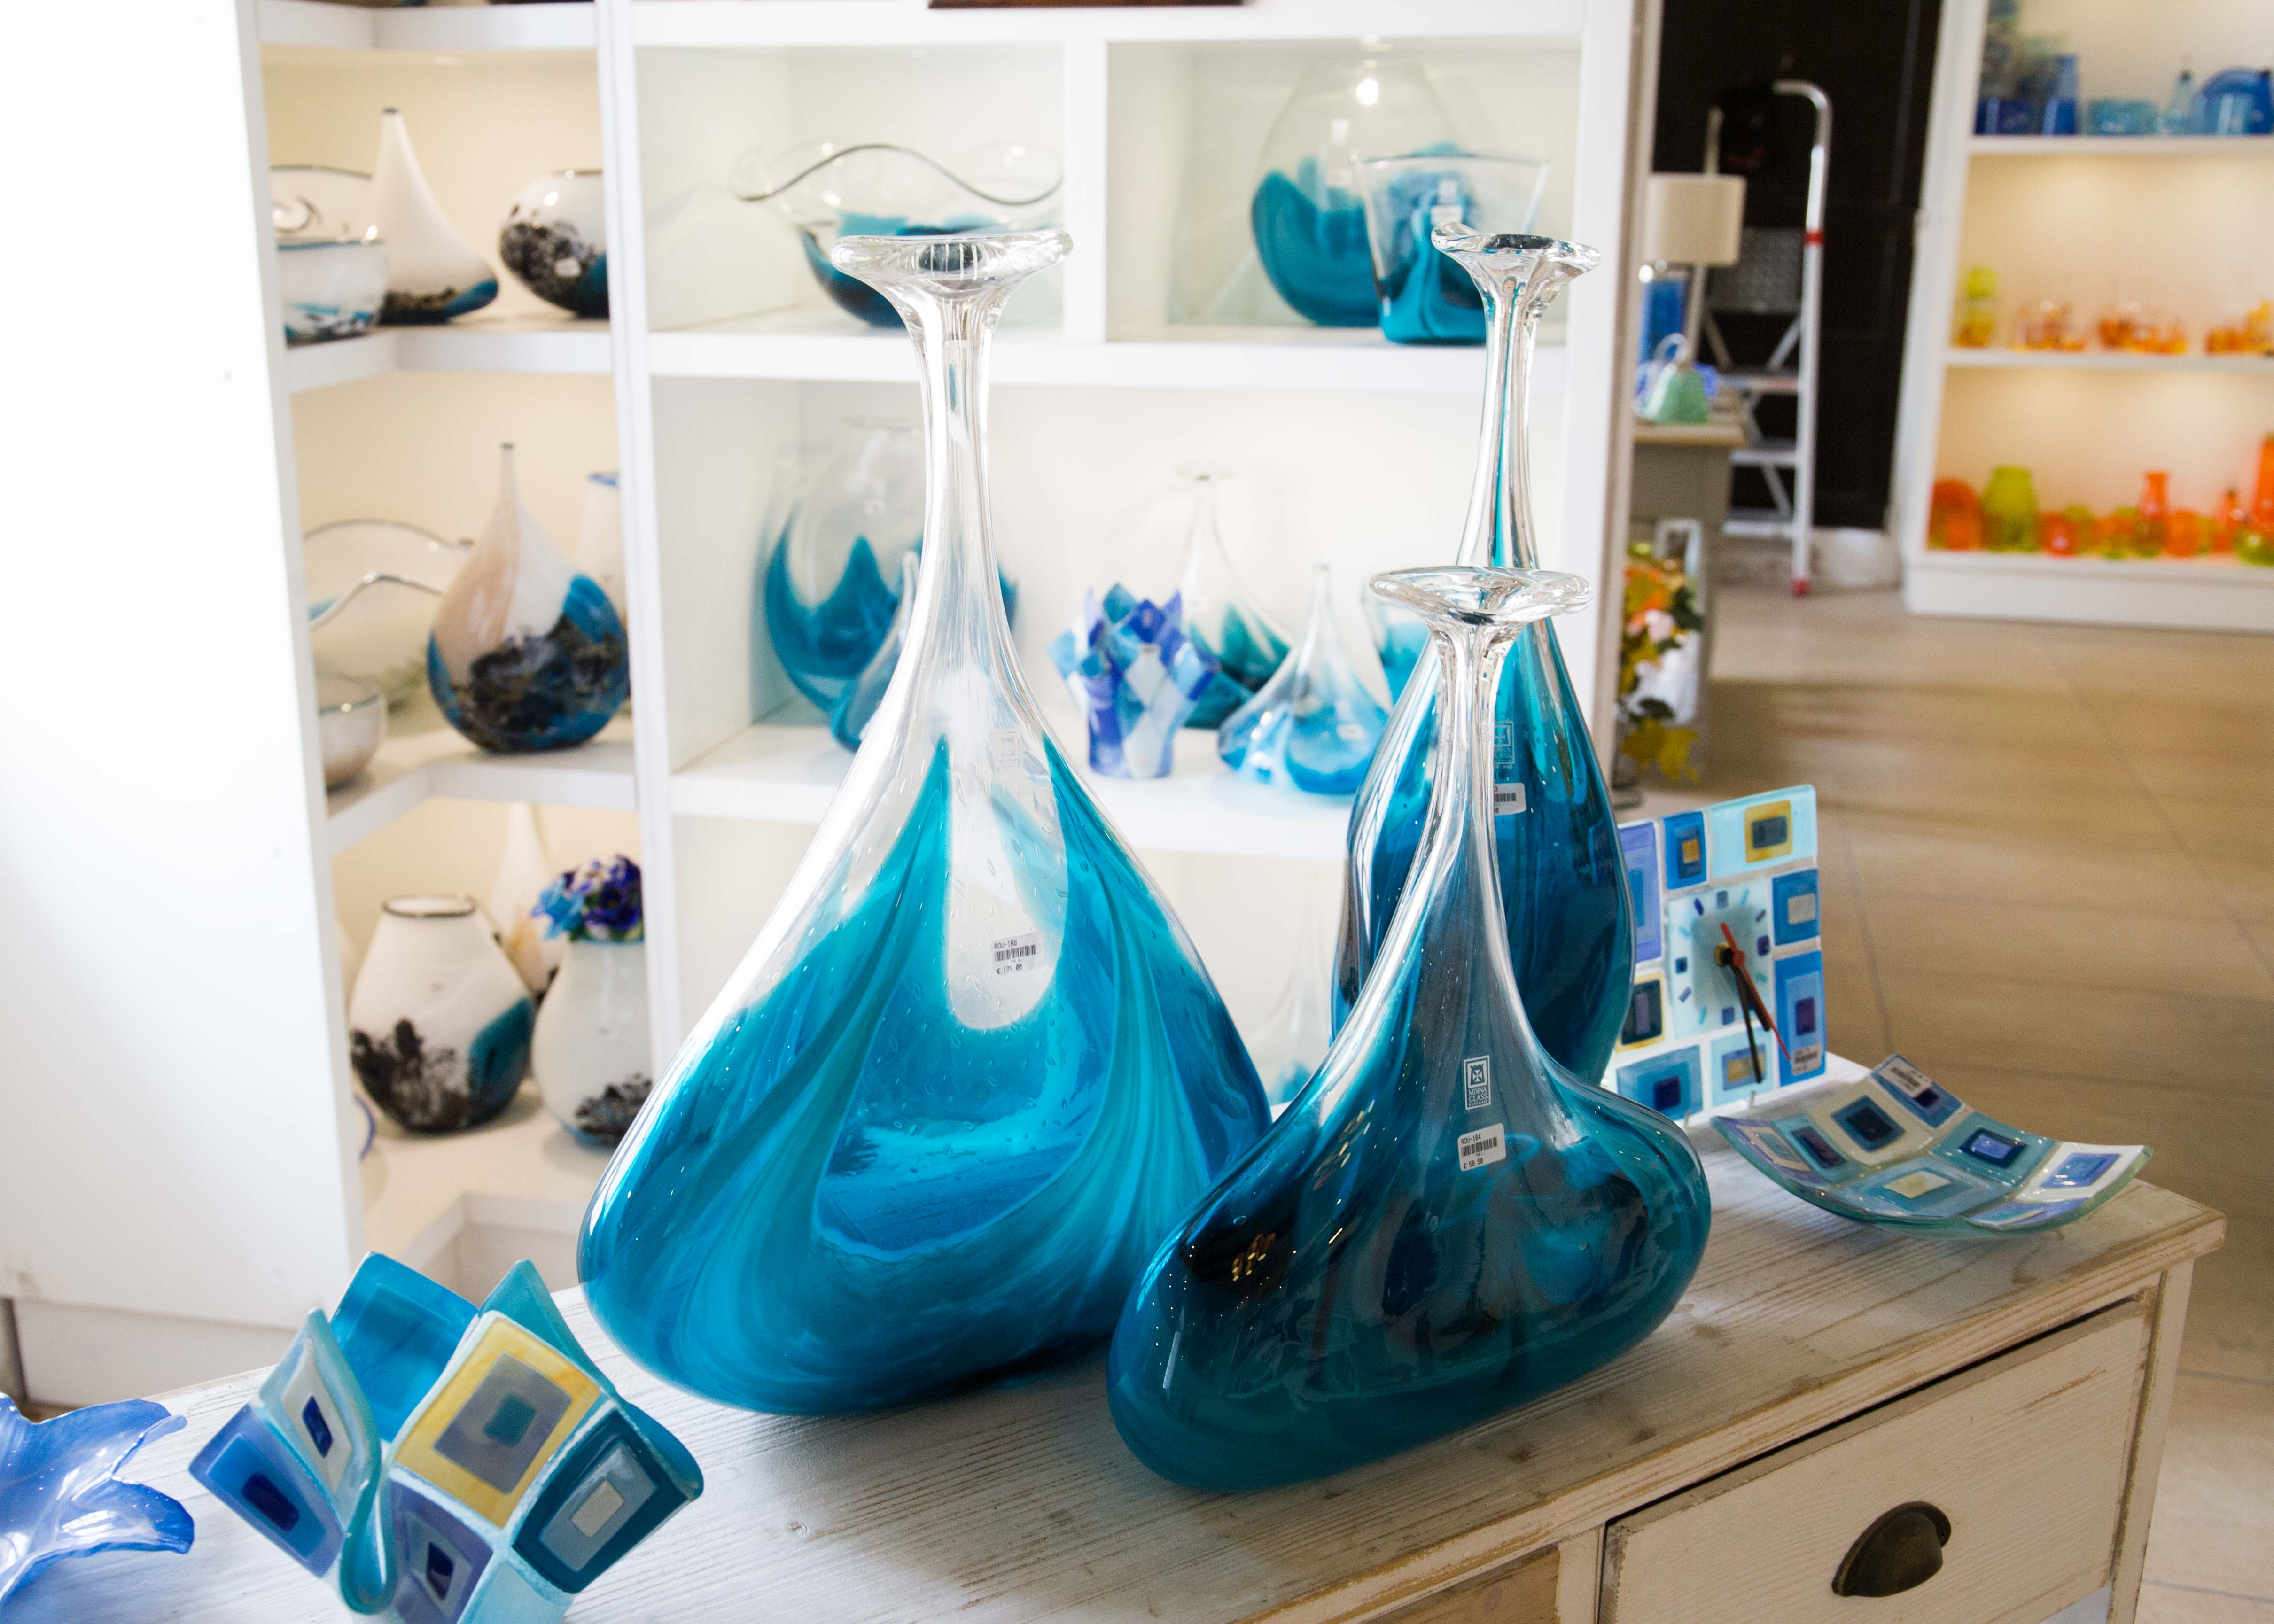 Malta souvenirs: Mdina glass